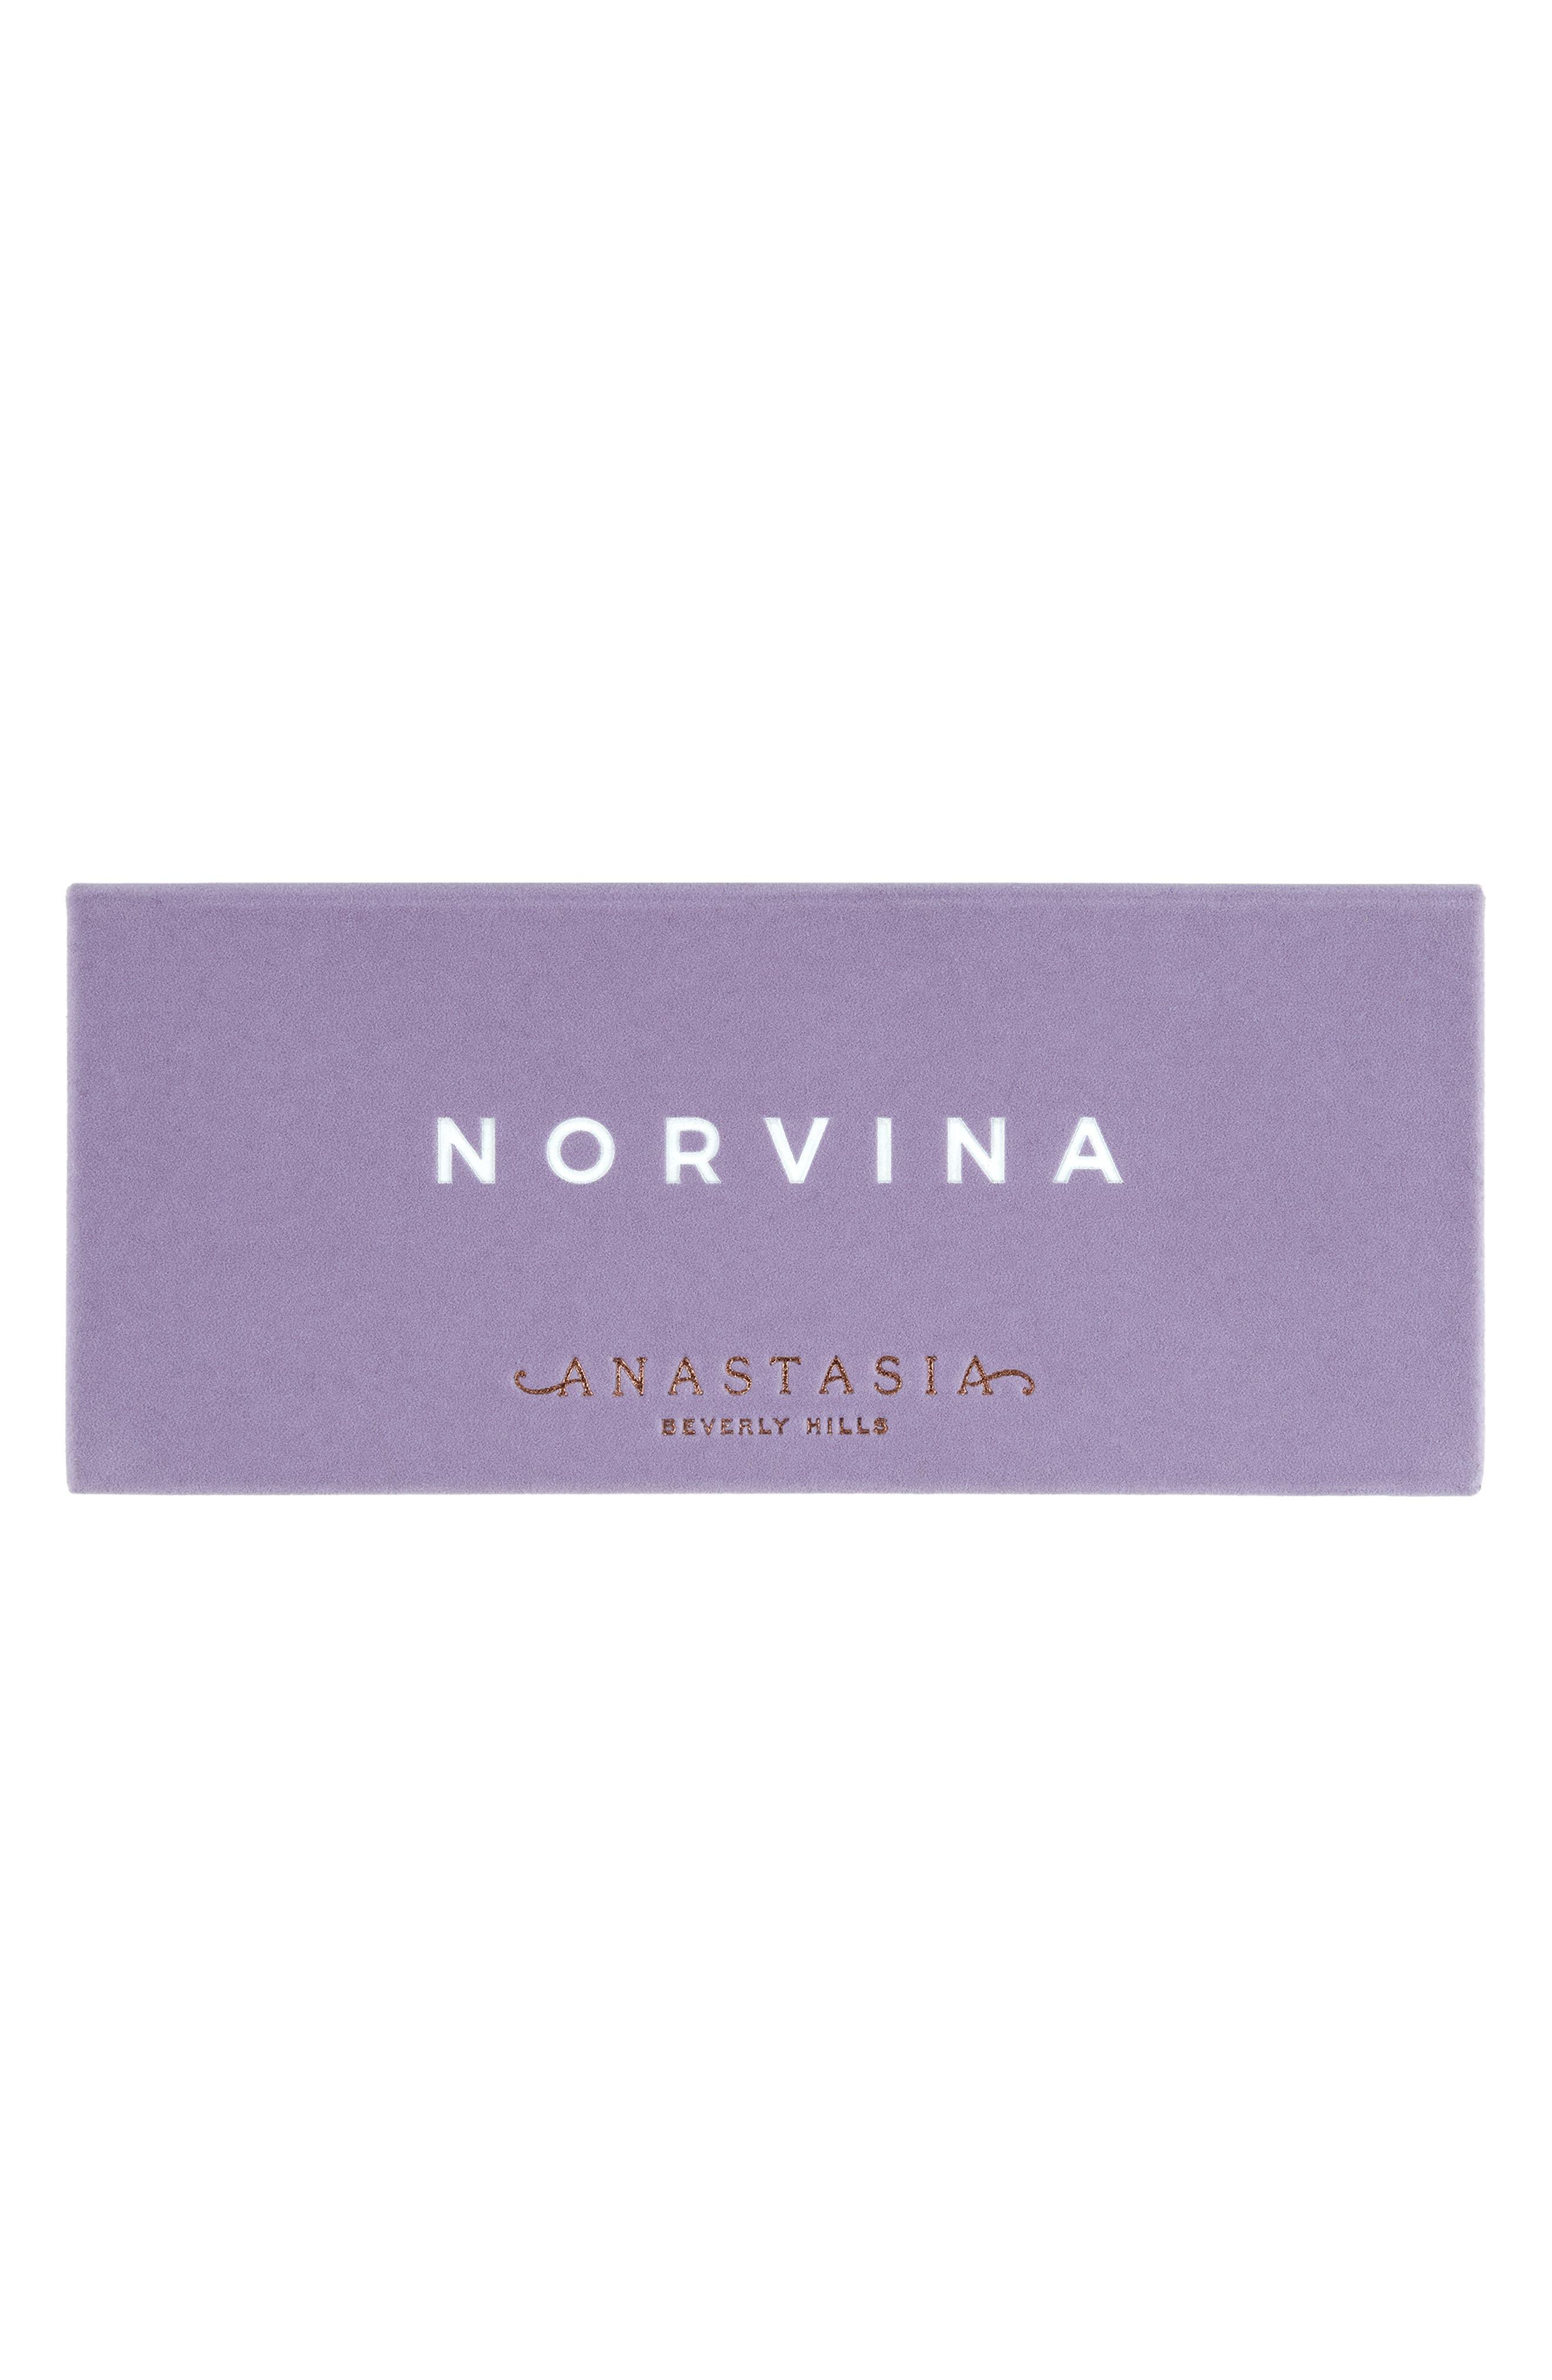 Norvina Eyeshadow Palette,                             Alternate thumbnail 4, color,                             NO COLOR